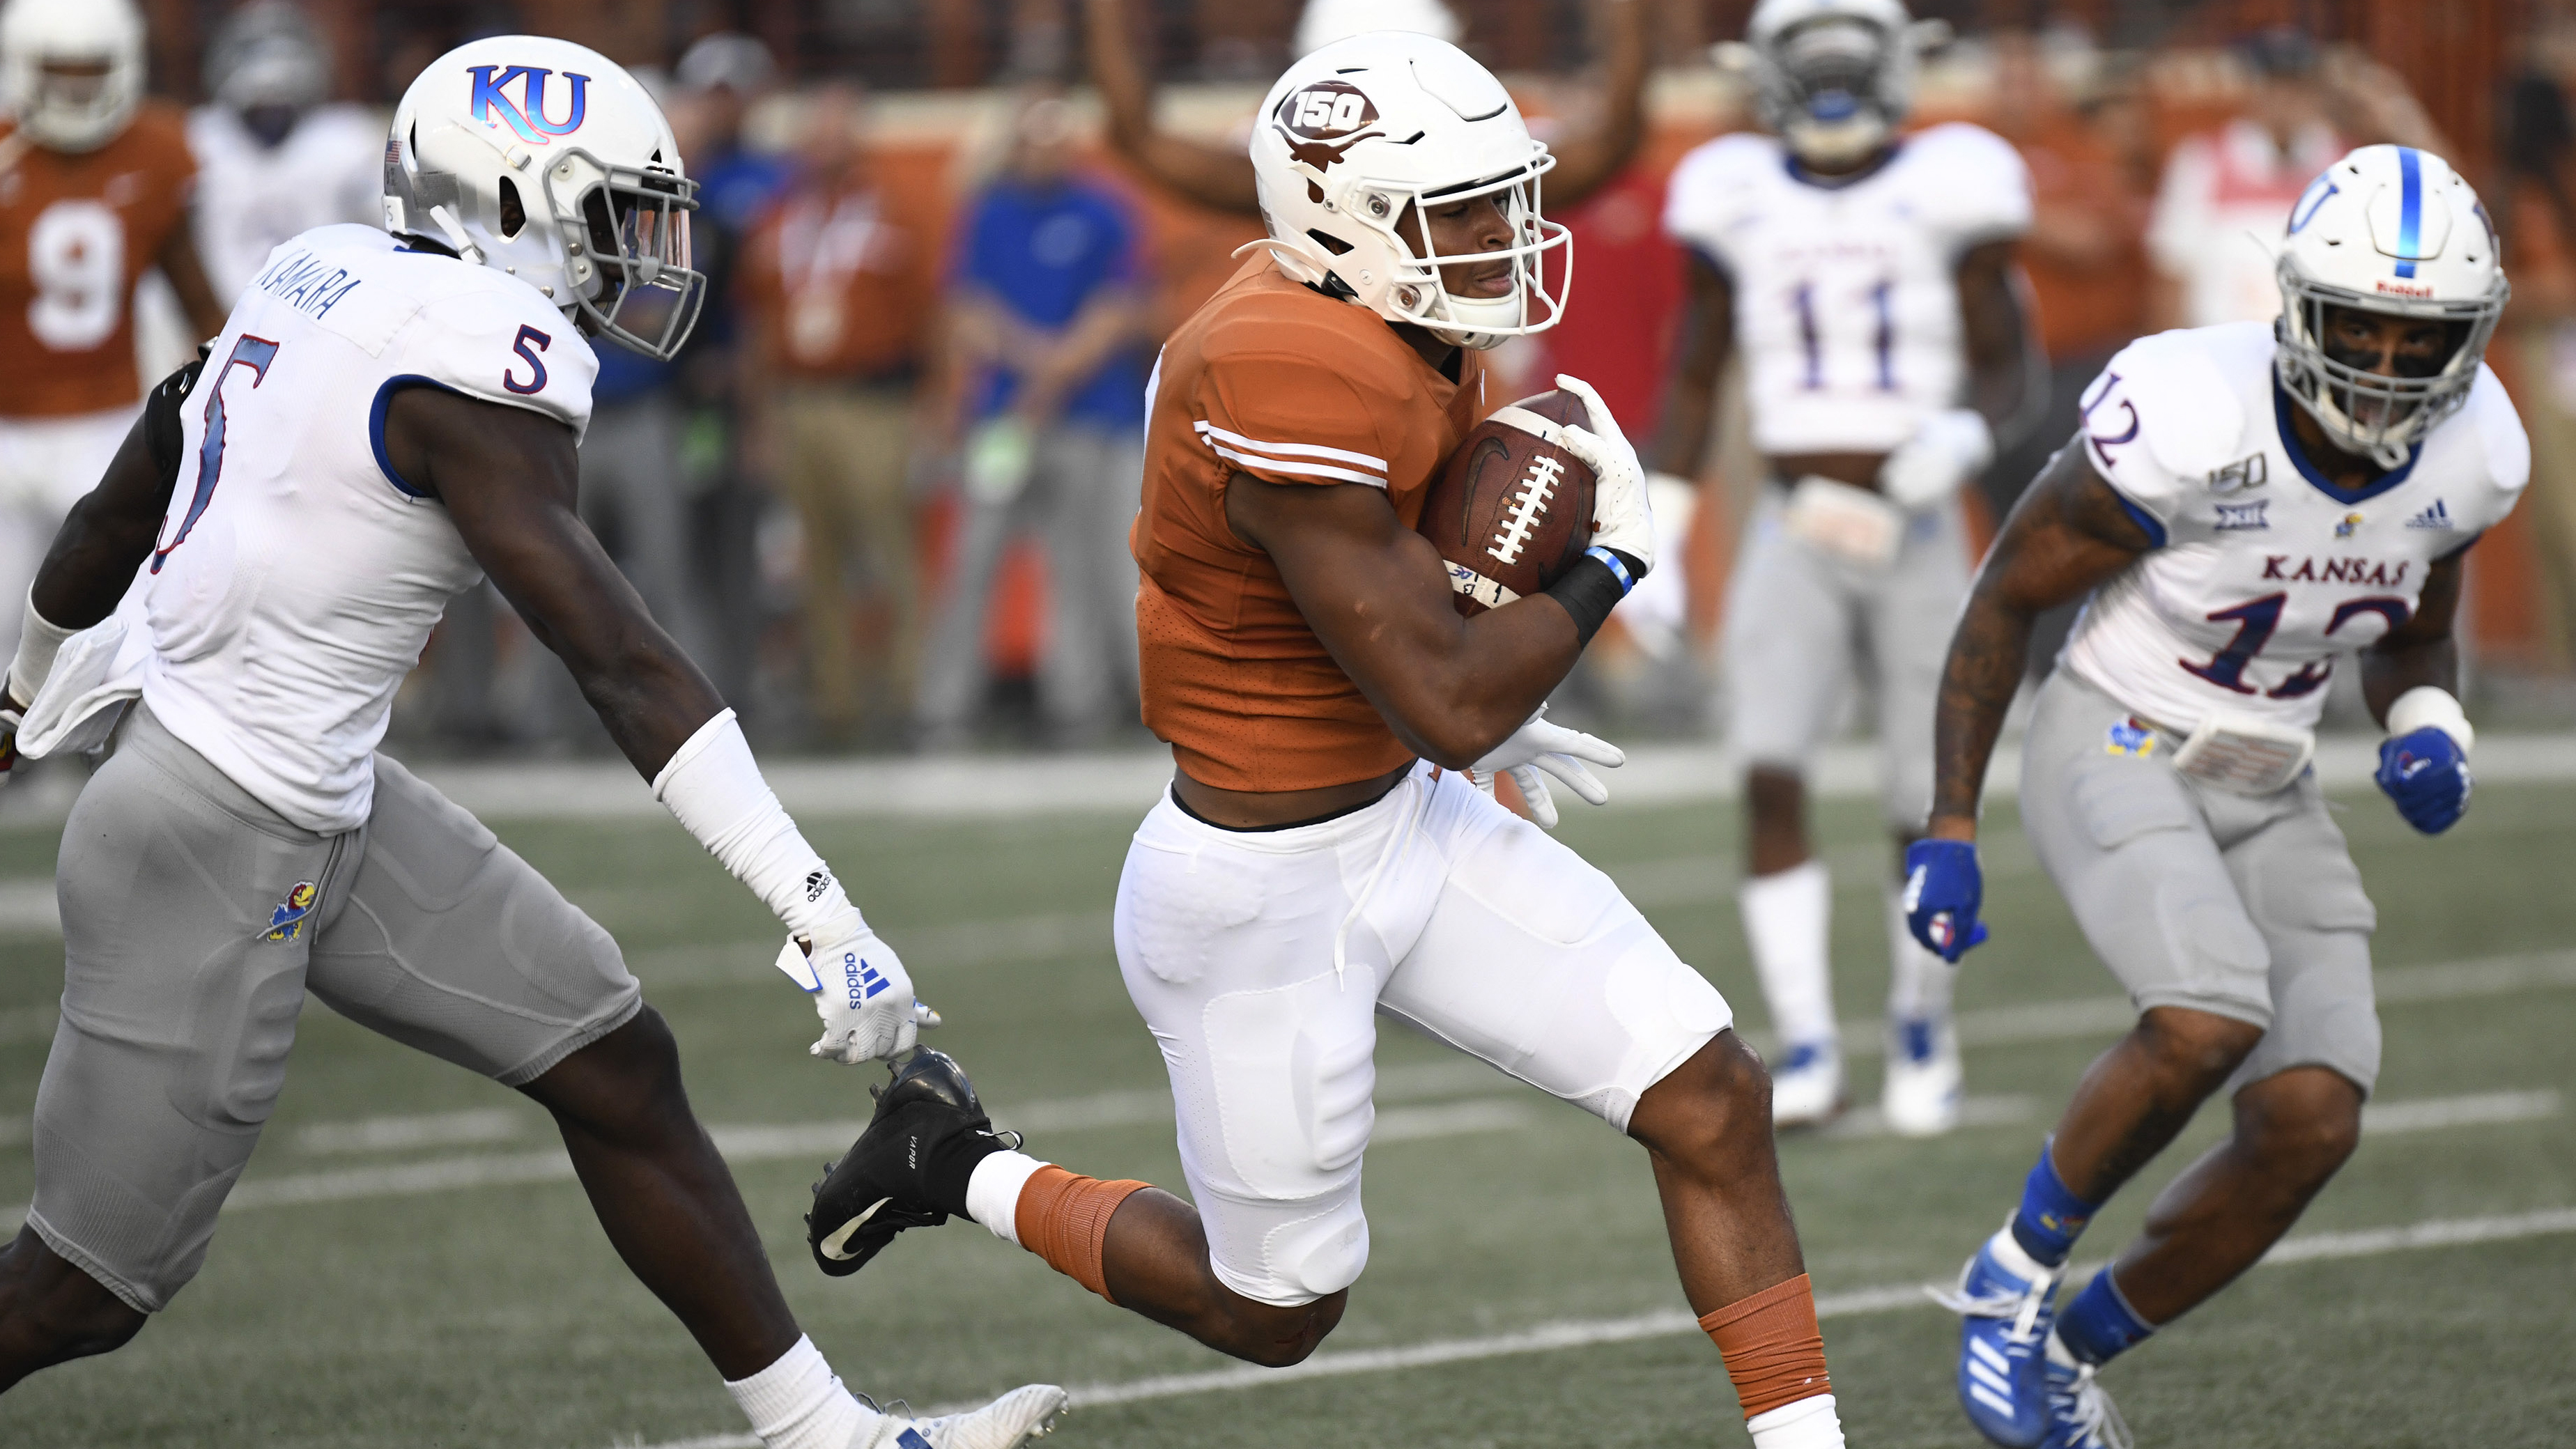 Kansas allows game-winning field goal as time expires, falls 50-48 to Texas